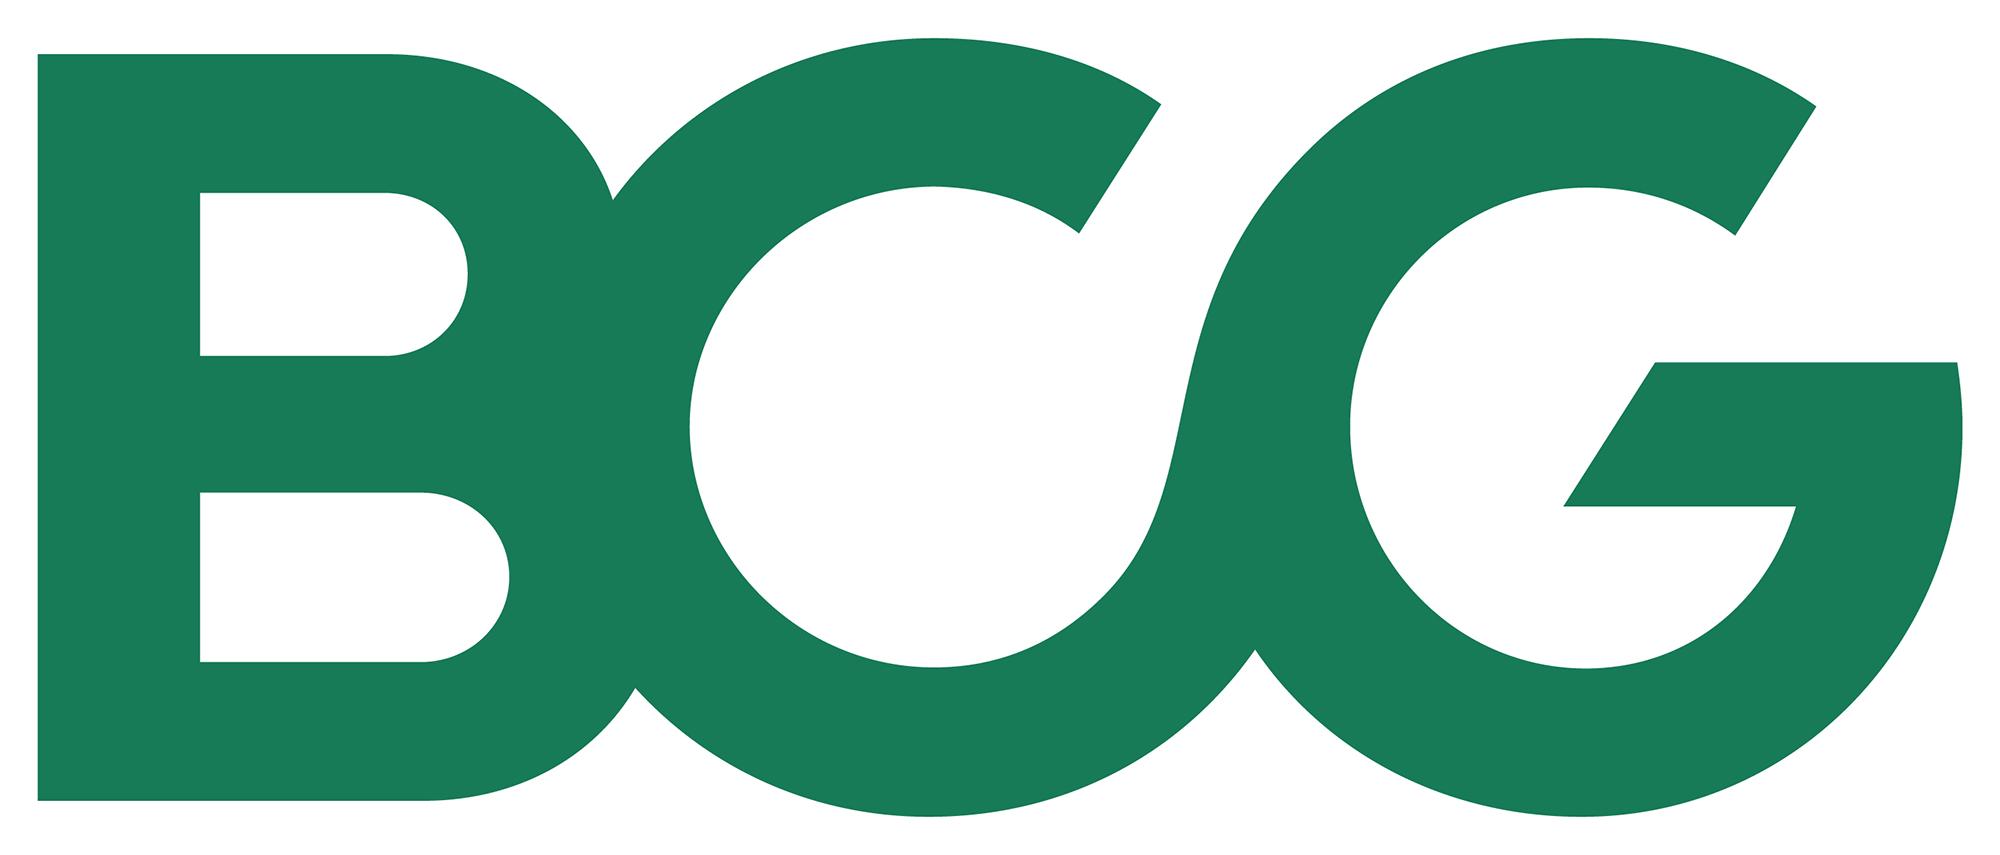 boston_consulting_group_logo_monogram.png